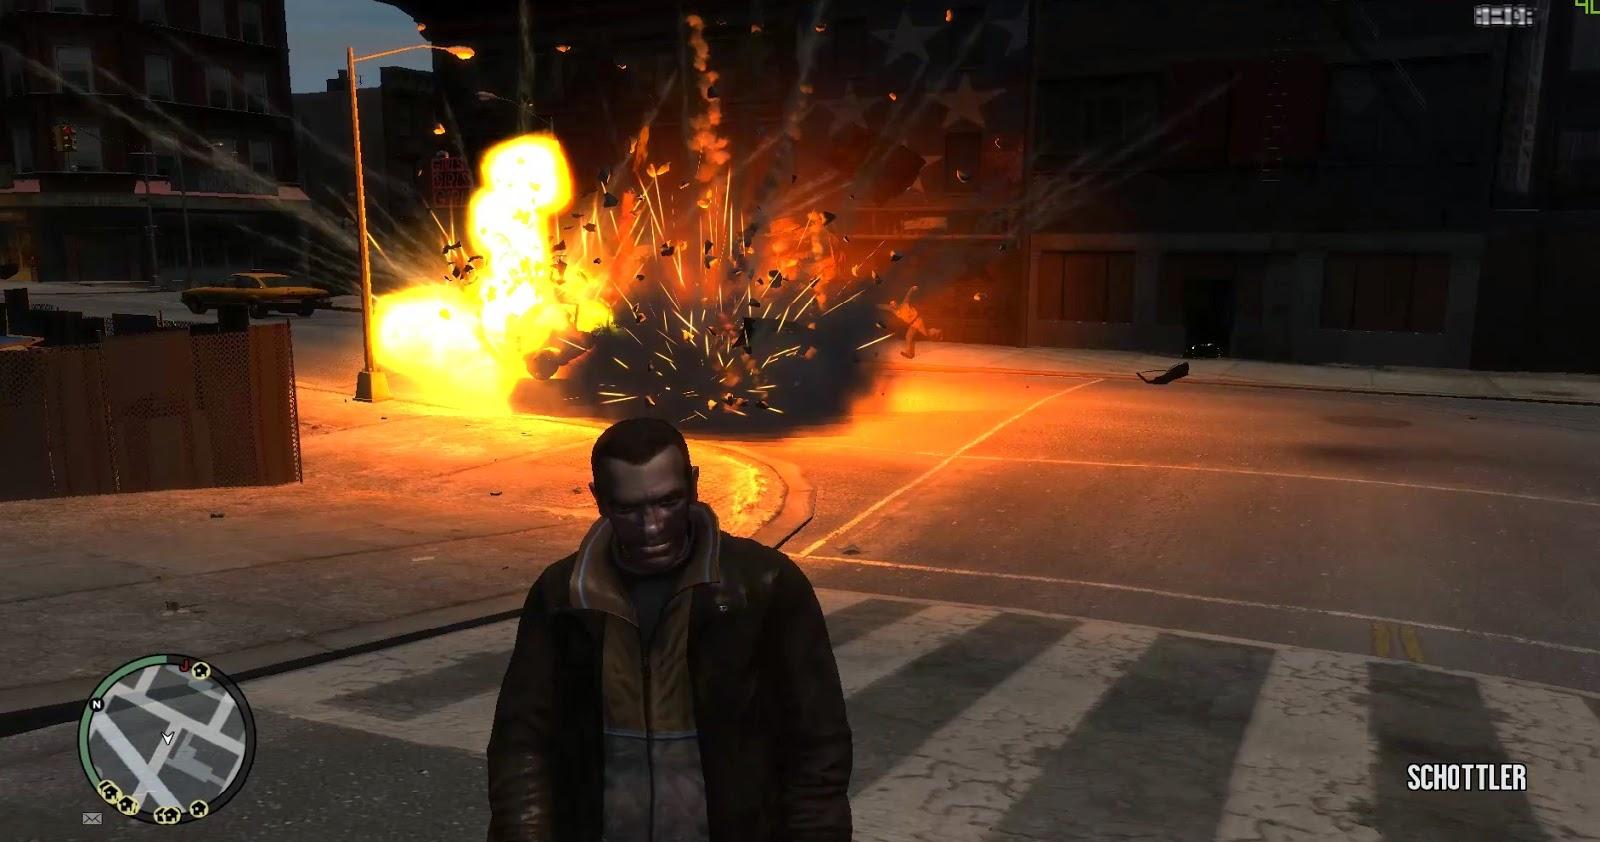 Grand Theft Auto V: How to Detonate Sticky Bombs